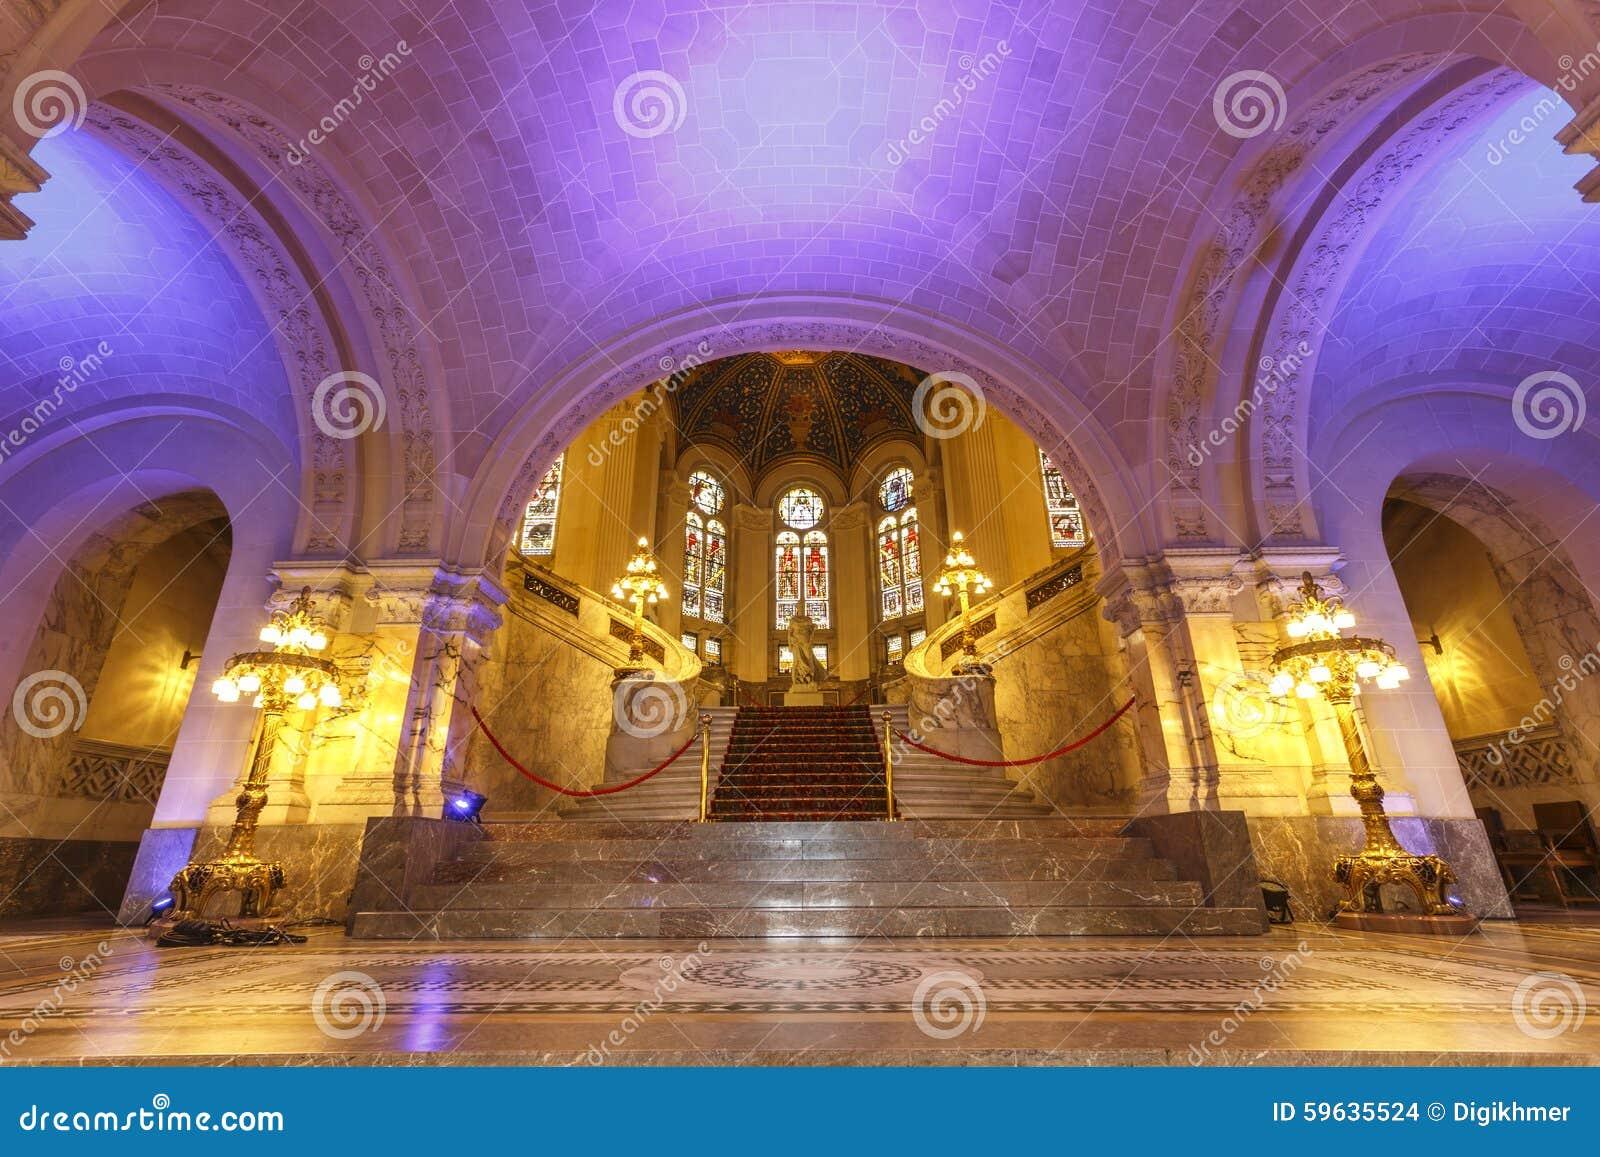 Corridoio principale variopinto del Palazzo della Pace